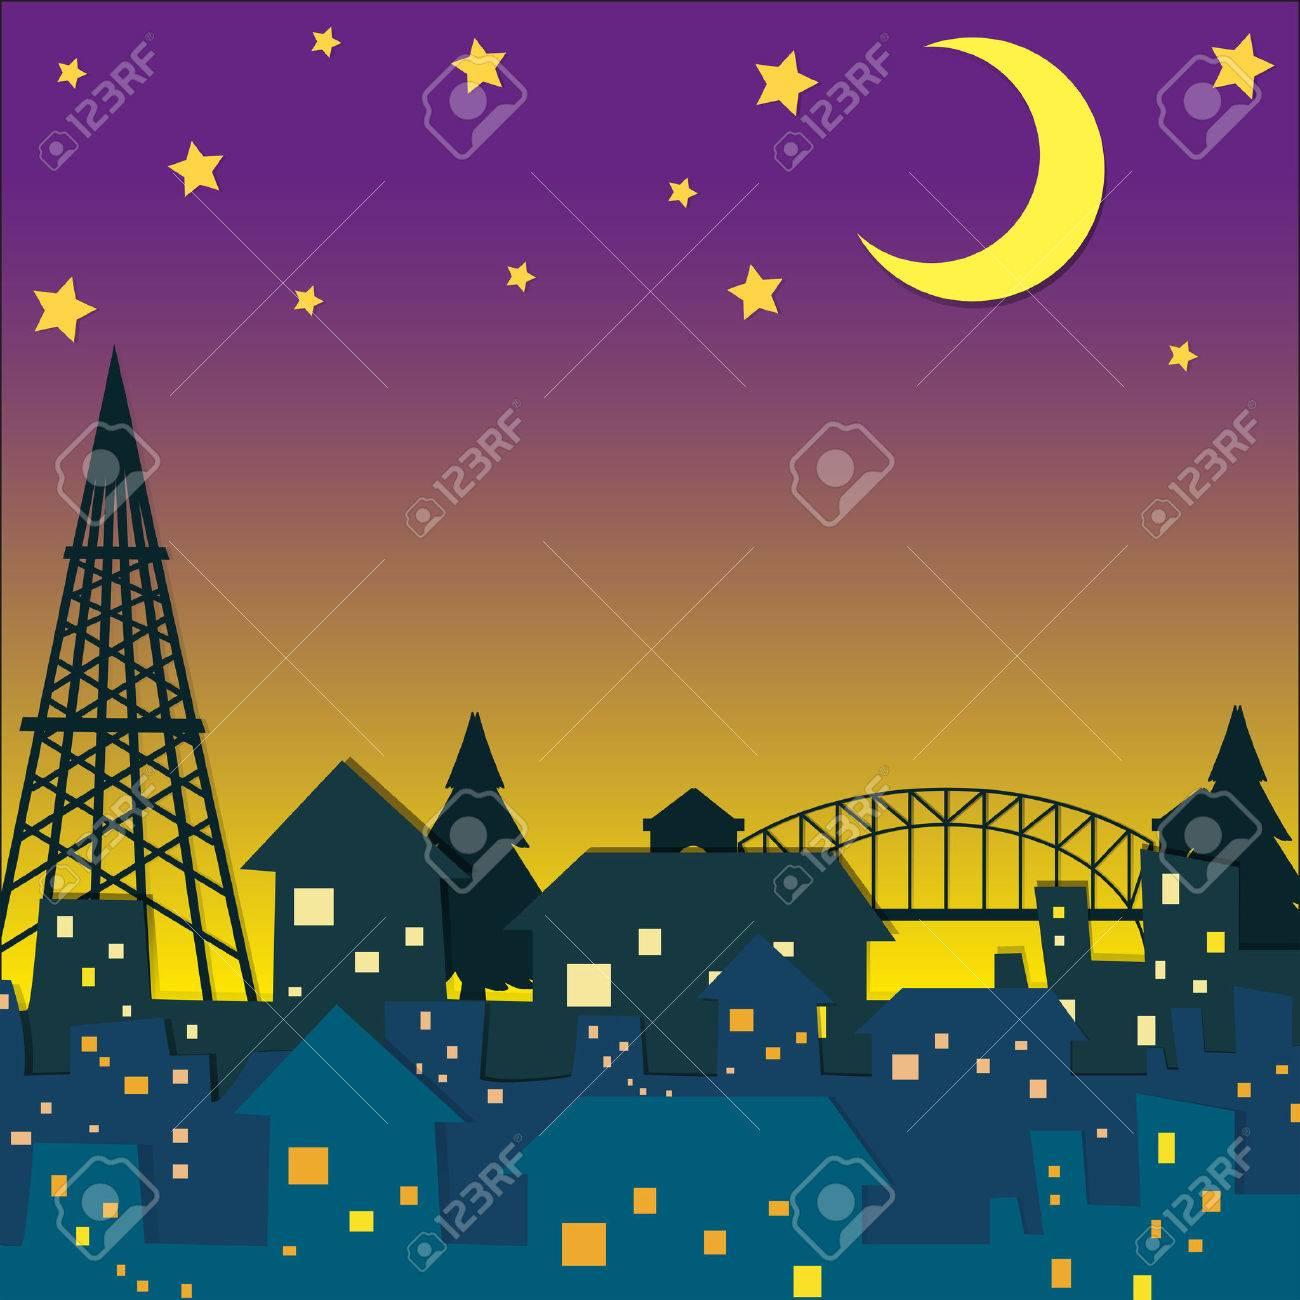 Neighborhood at night time illustration.